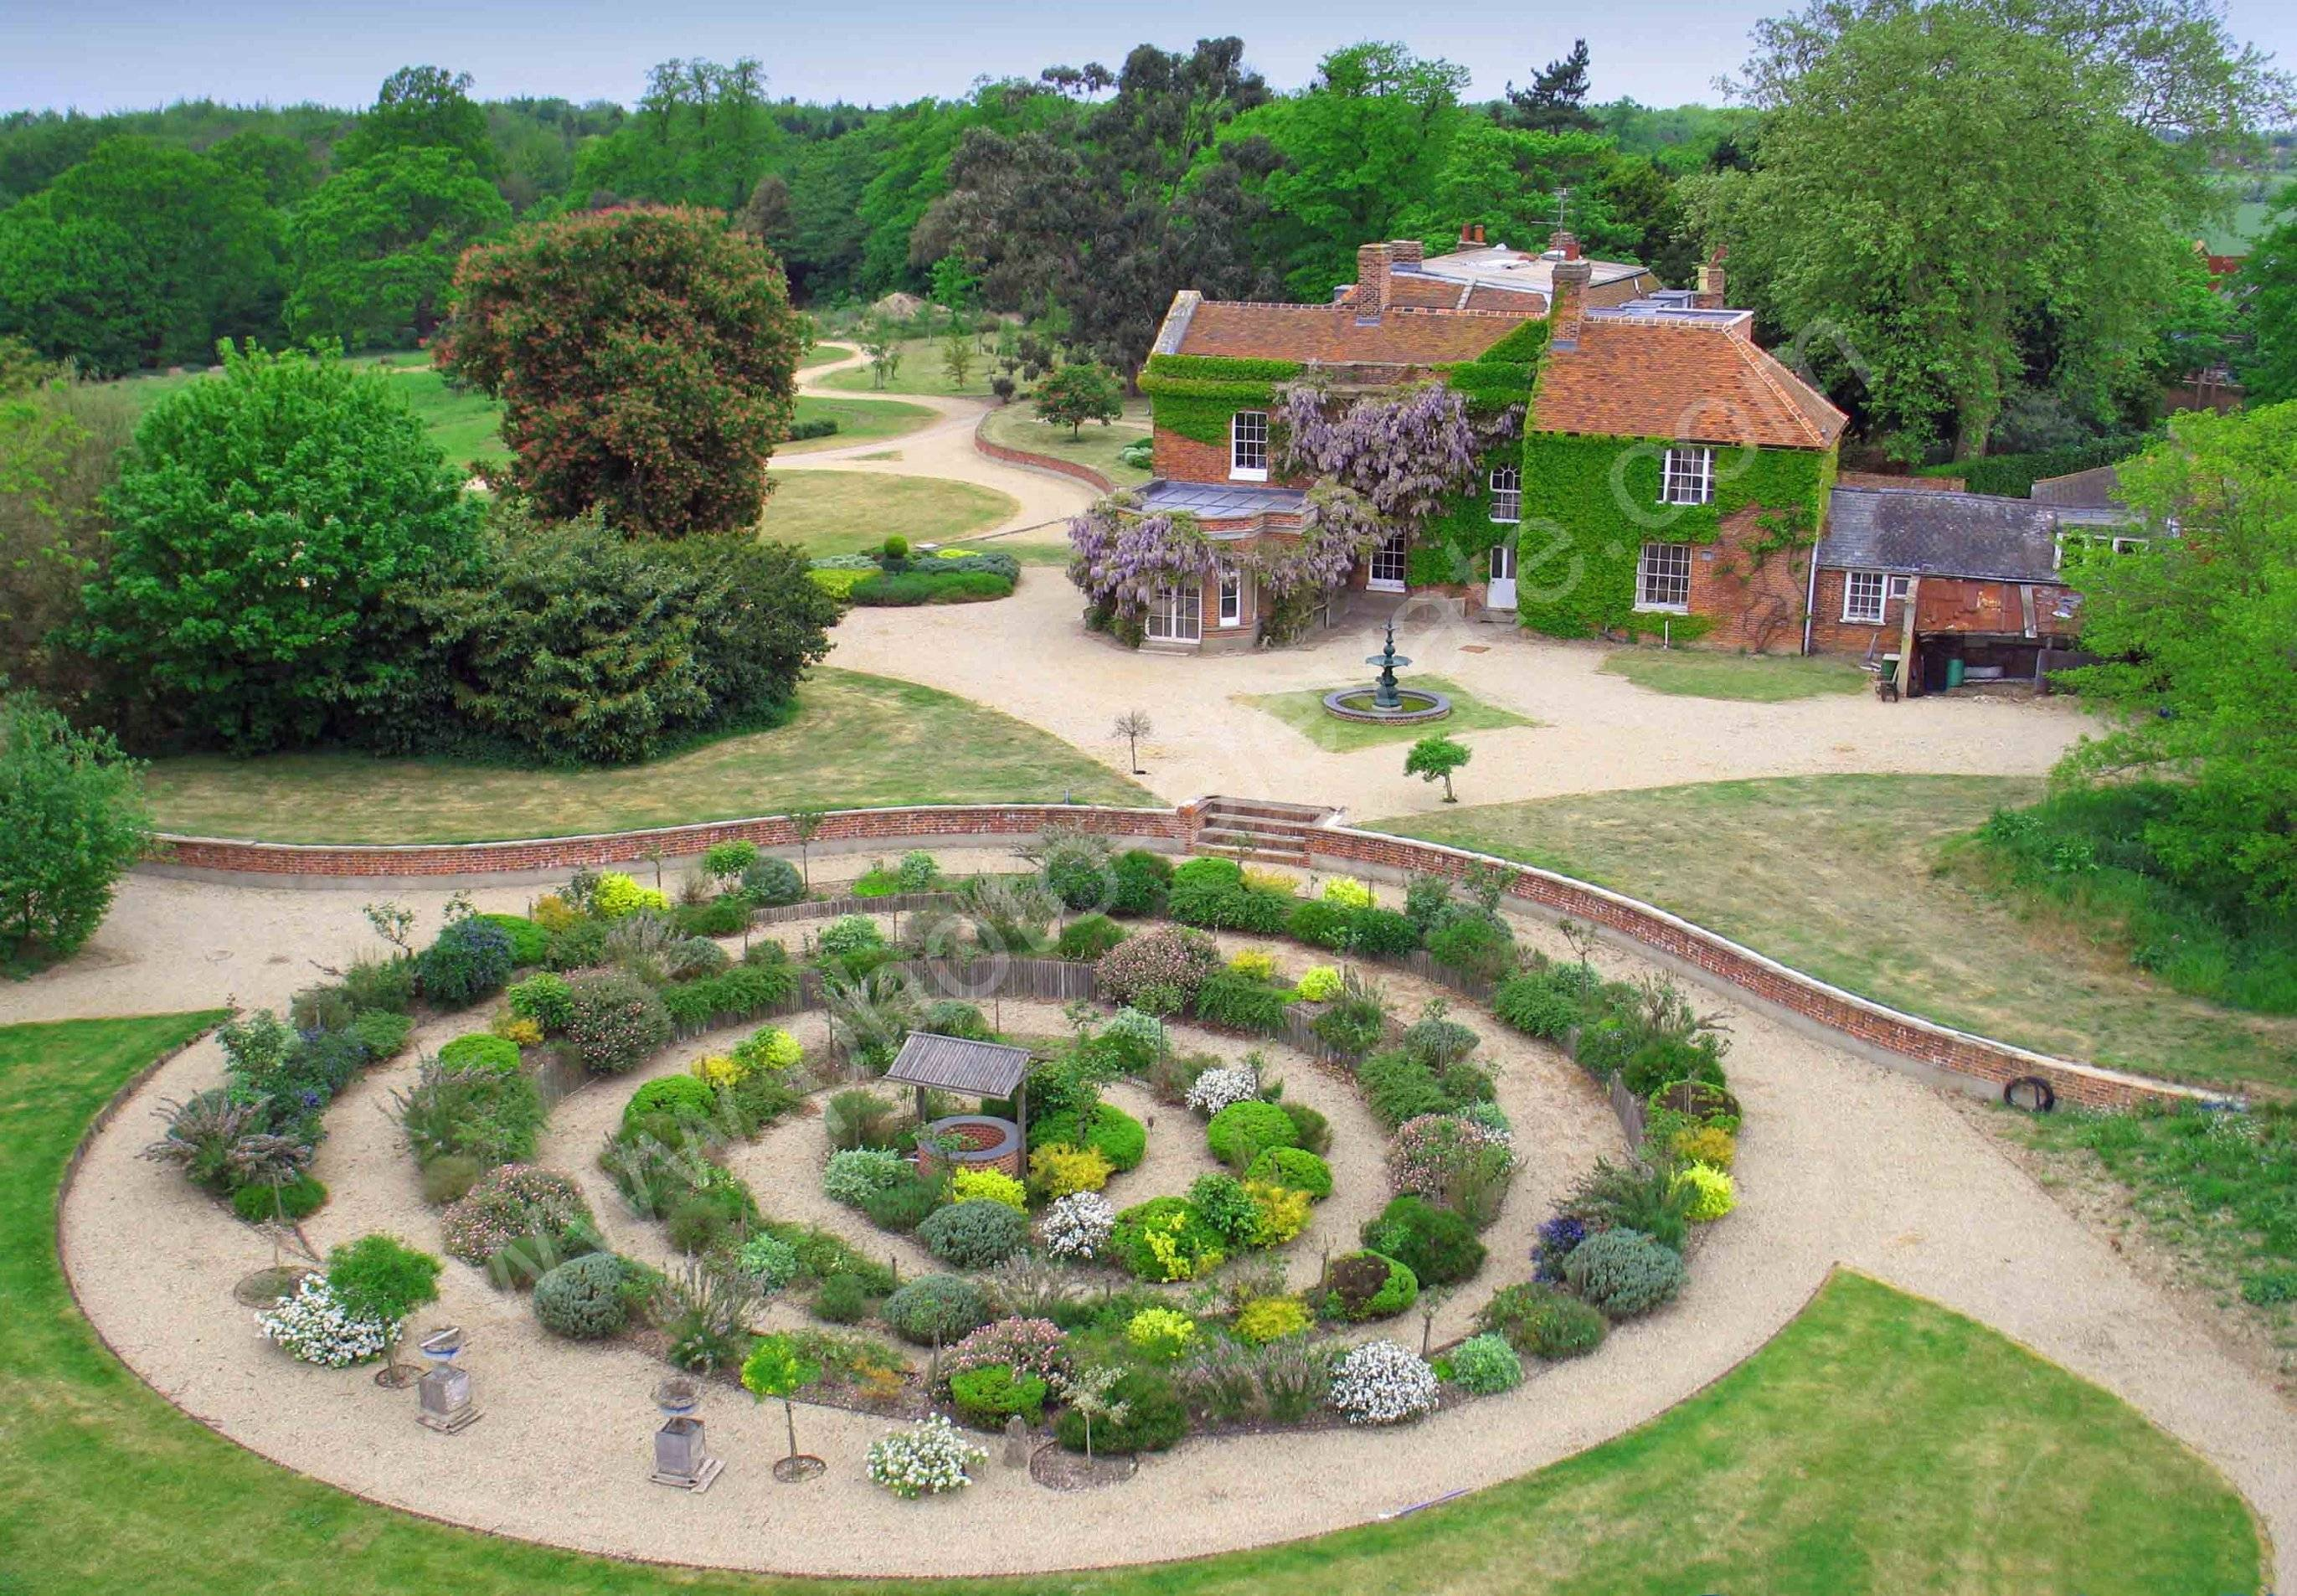 Ailsford House Gardens